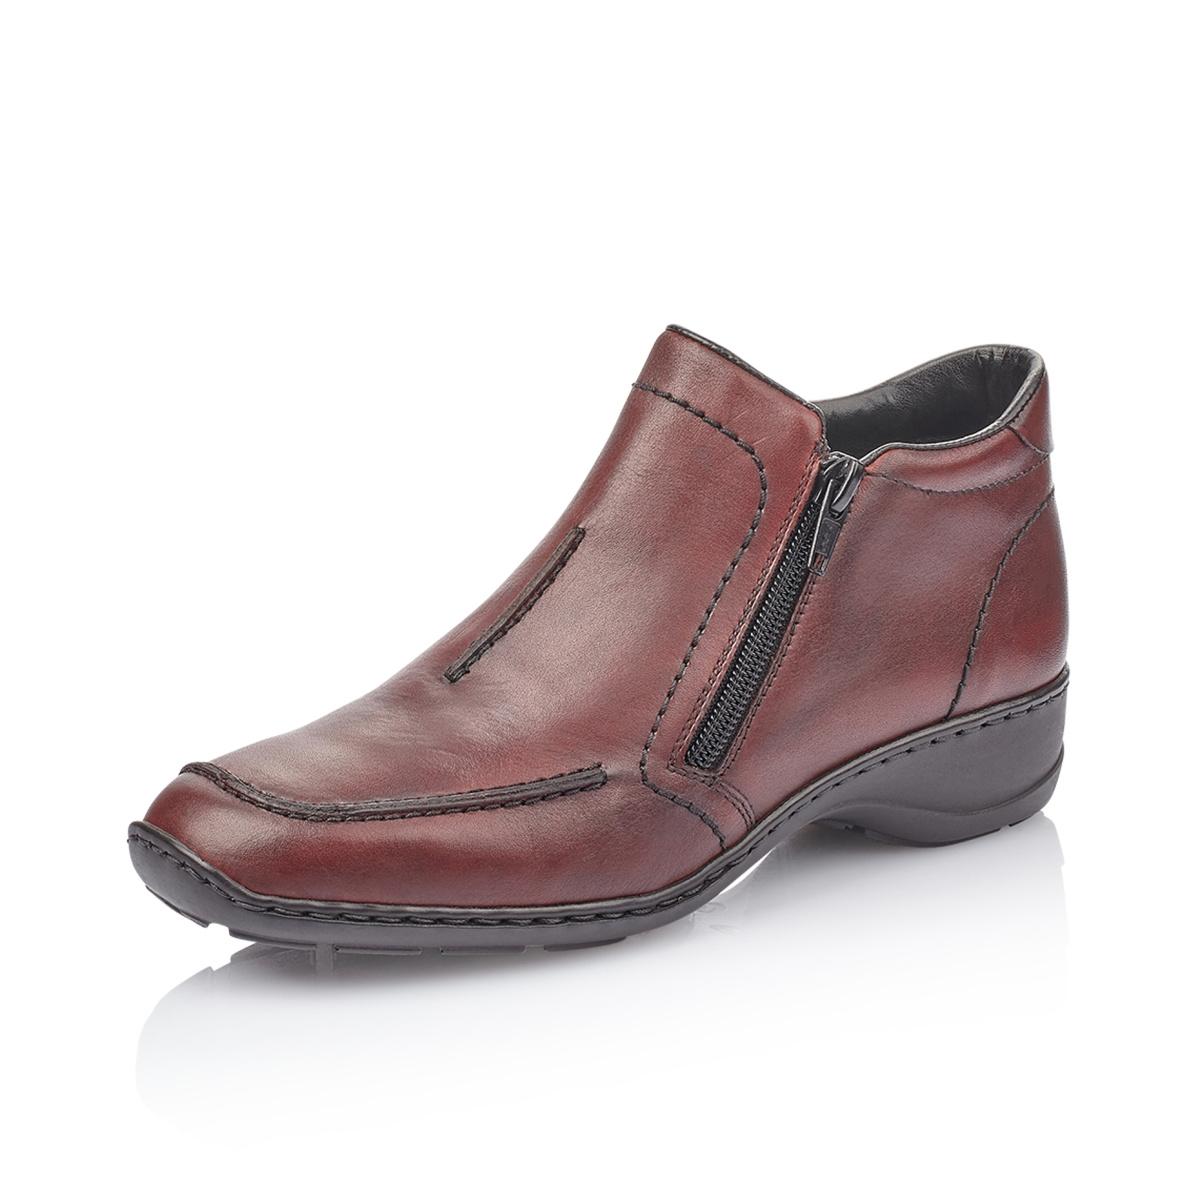 Dámská obuv RIEKER 58386 35 ROT H W 8  55b0b0df80